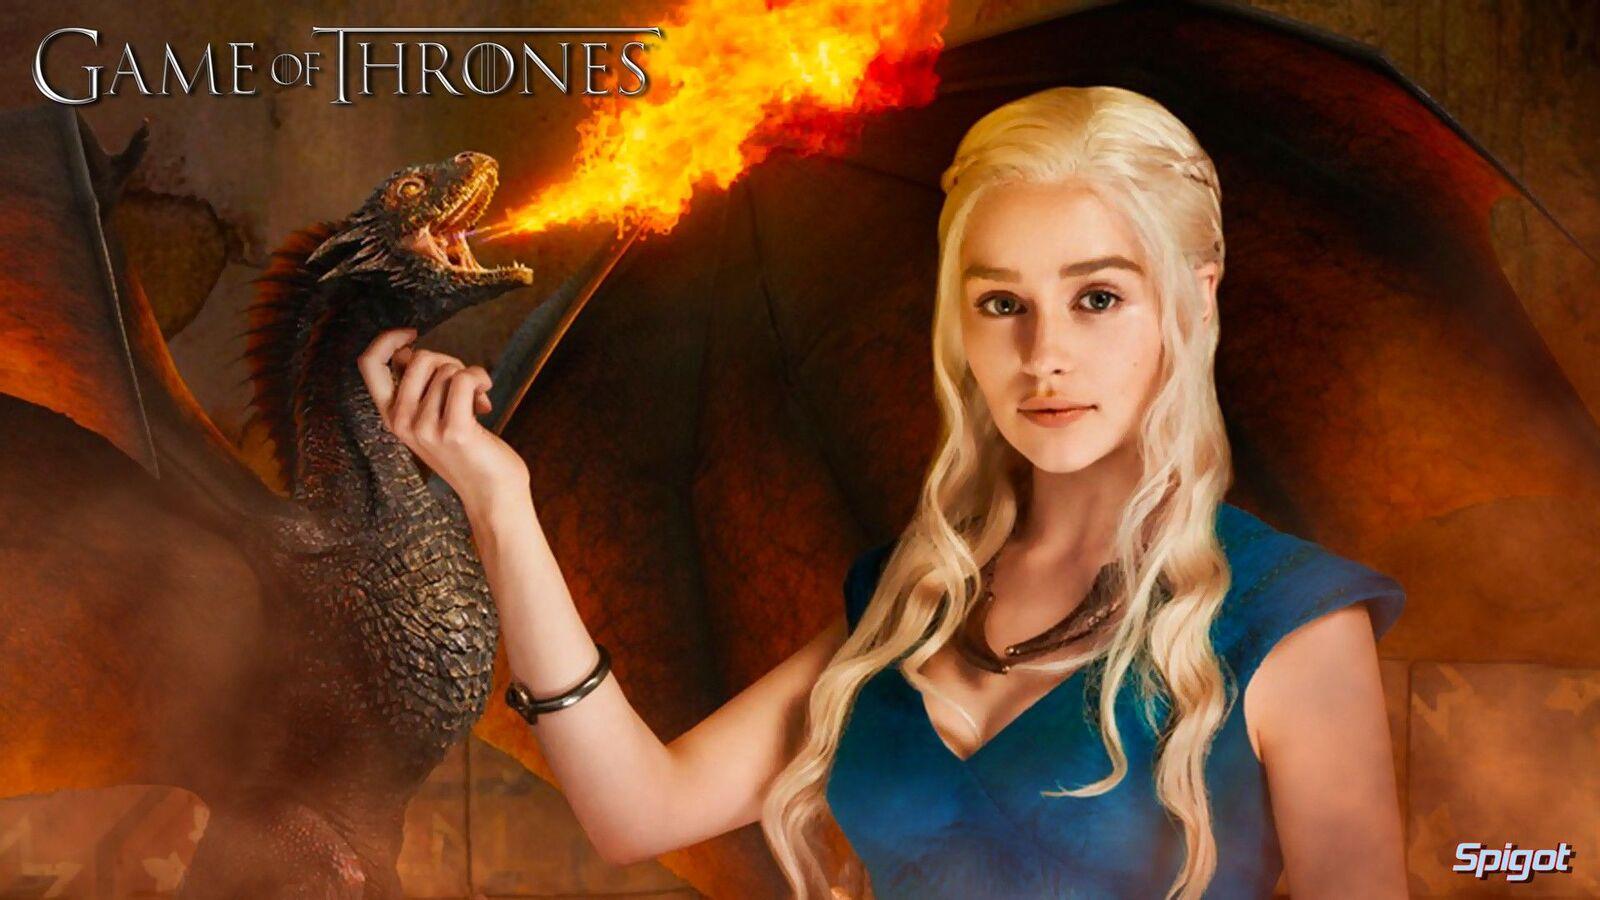 صور Game Of Thrones خلفيات لعبة صراع العروش Game Of Thrones Theme صقور الإبدآع